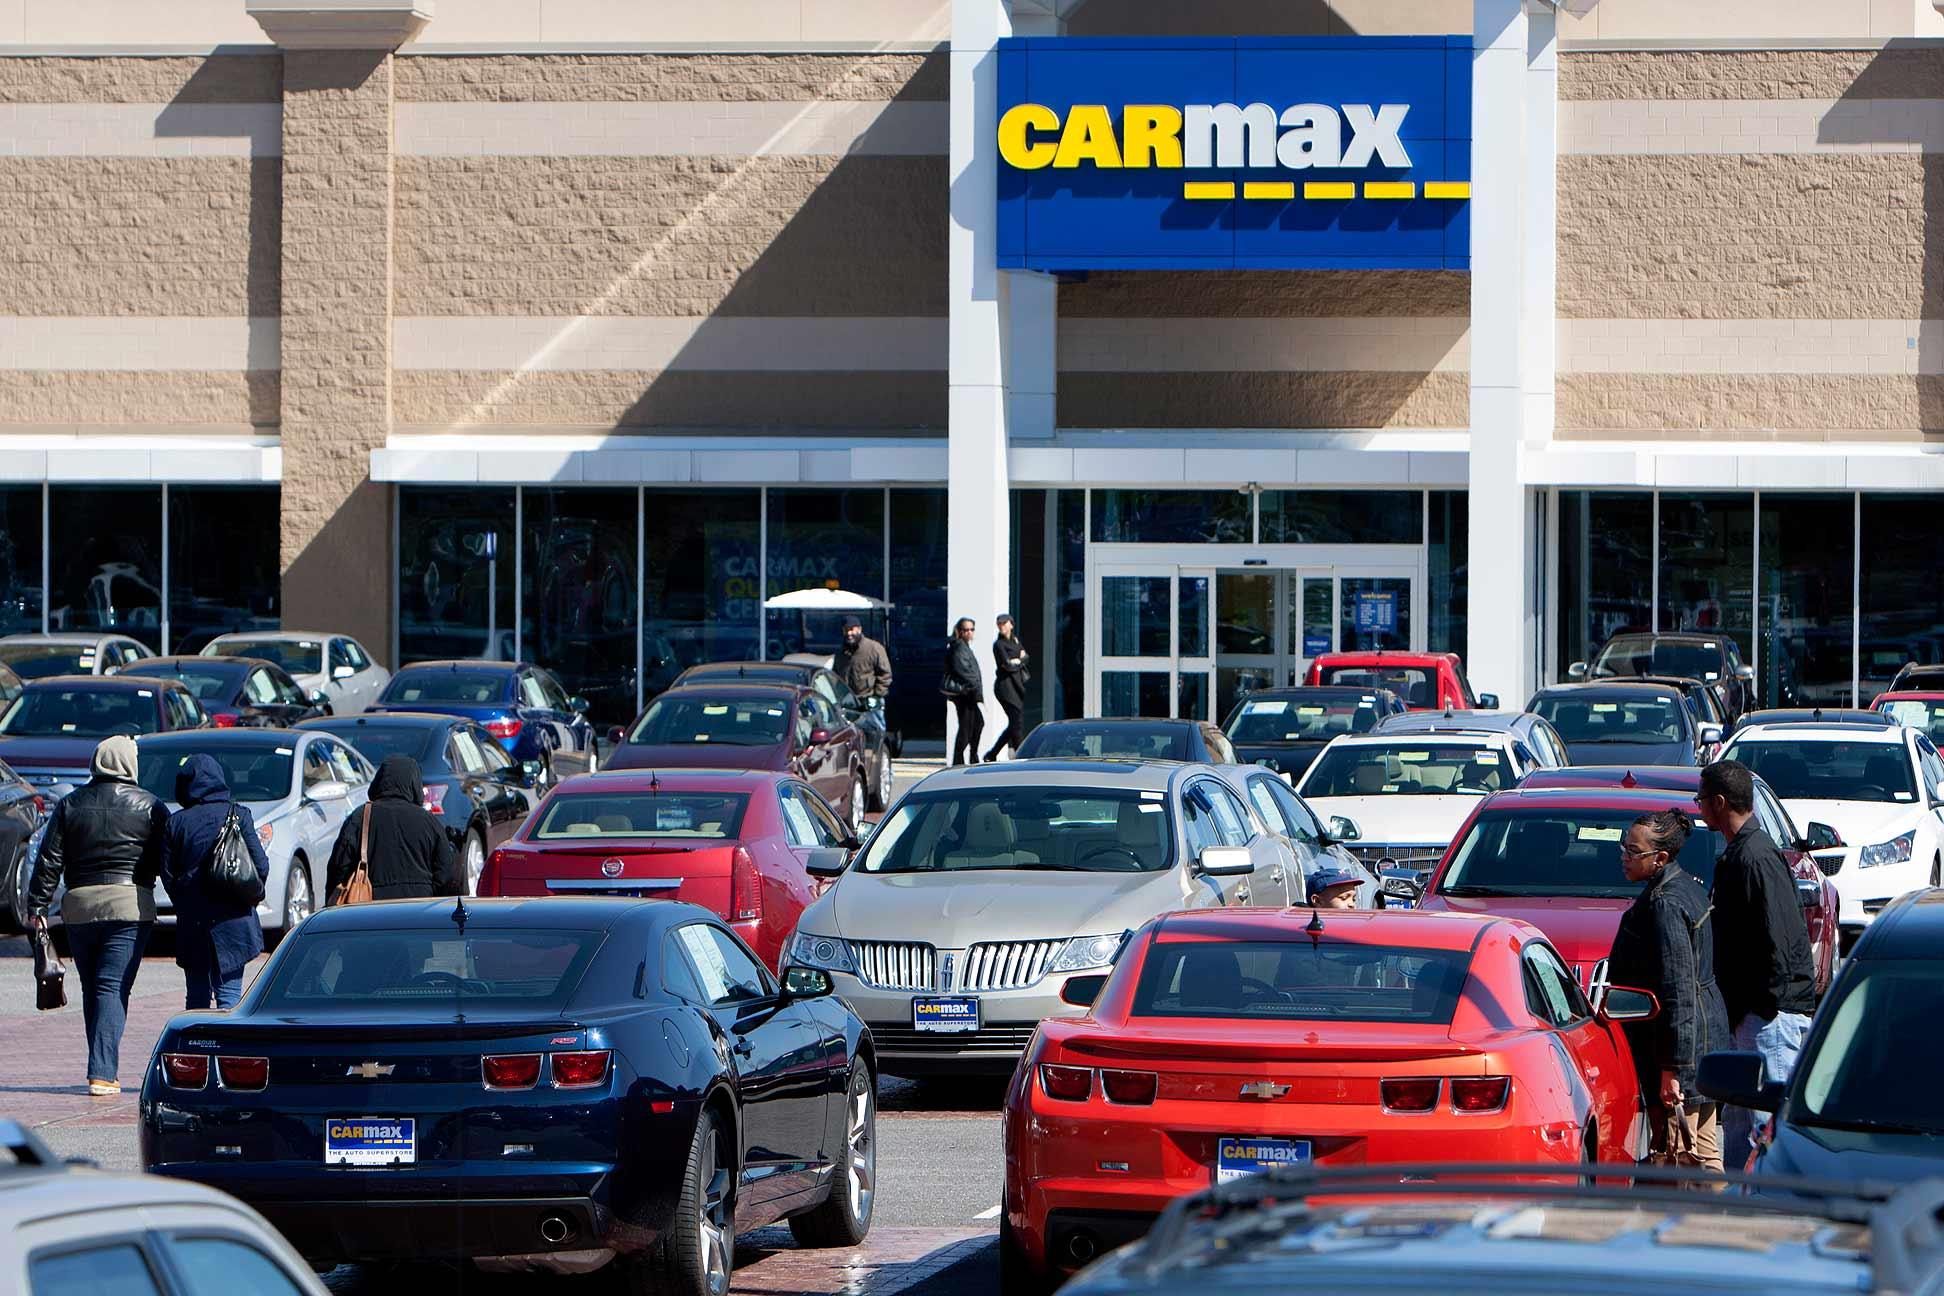 Carmax Sales Rise Despite Slower Traffic Tax Refund Delays